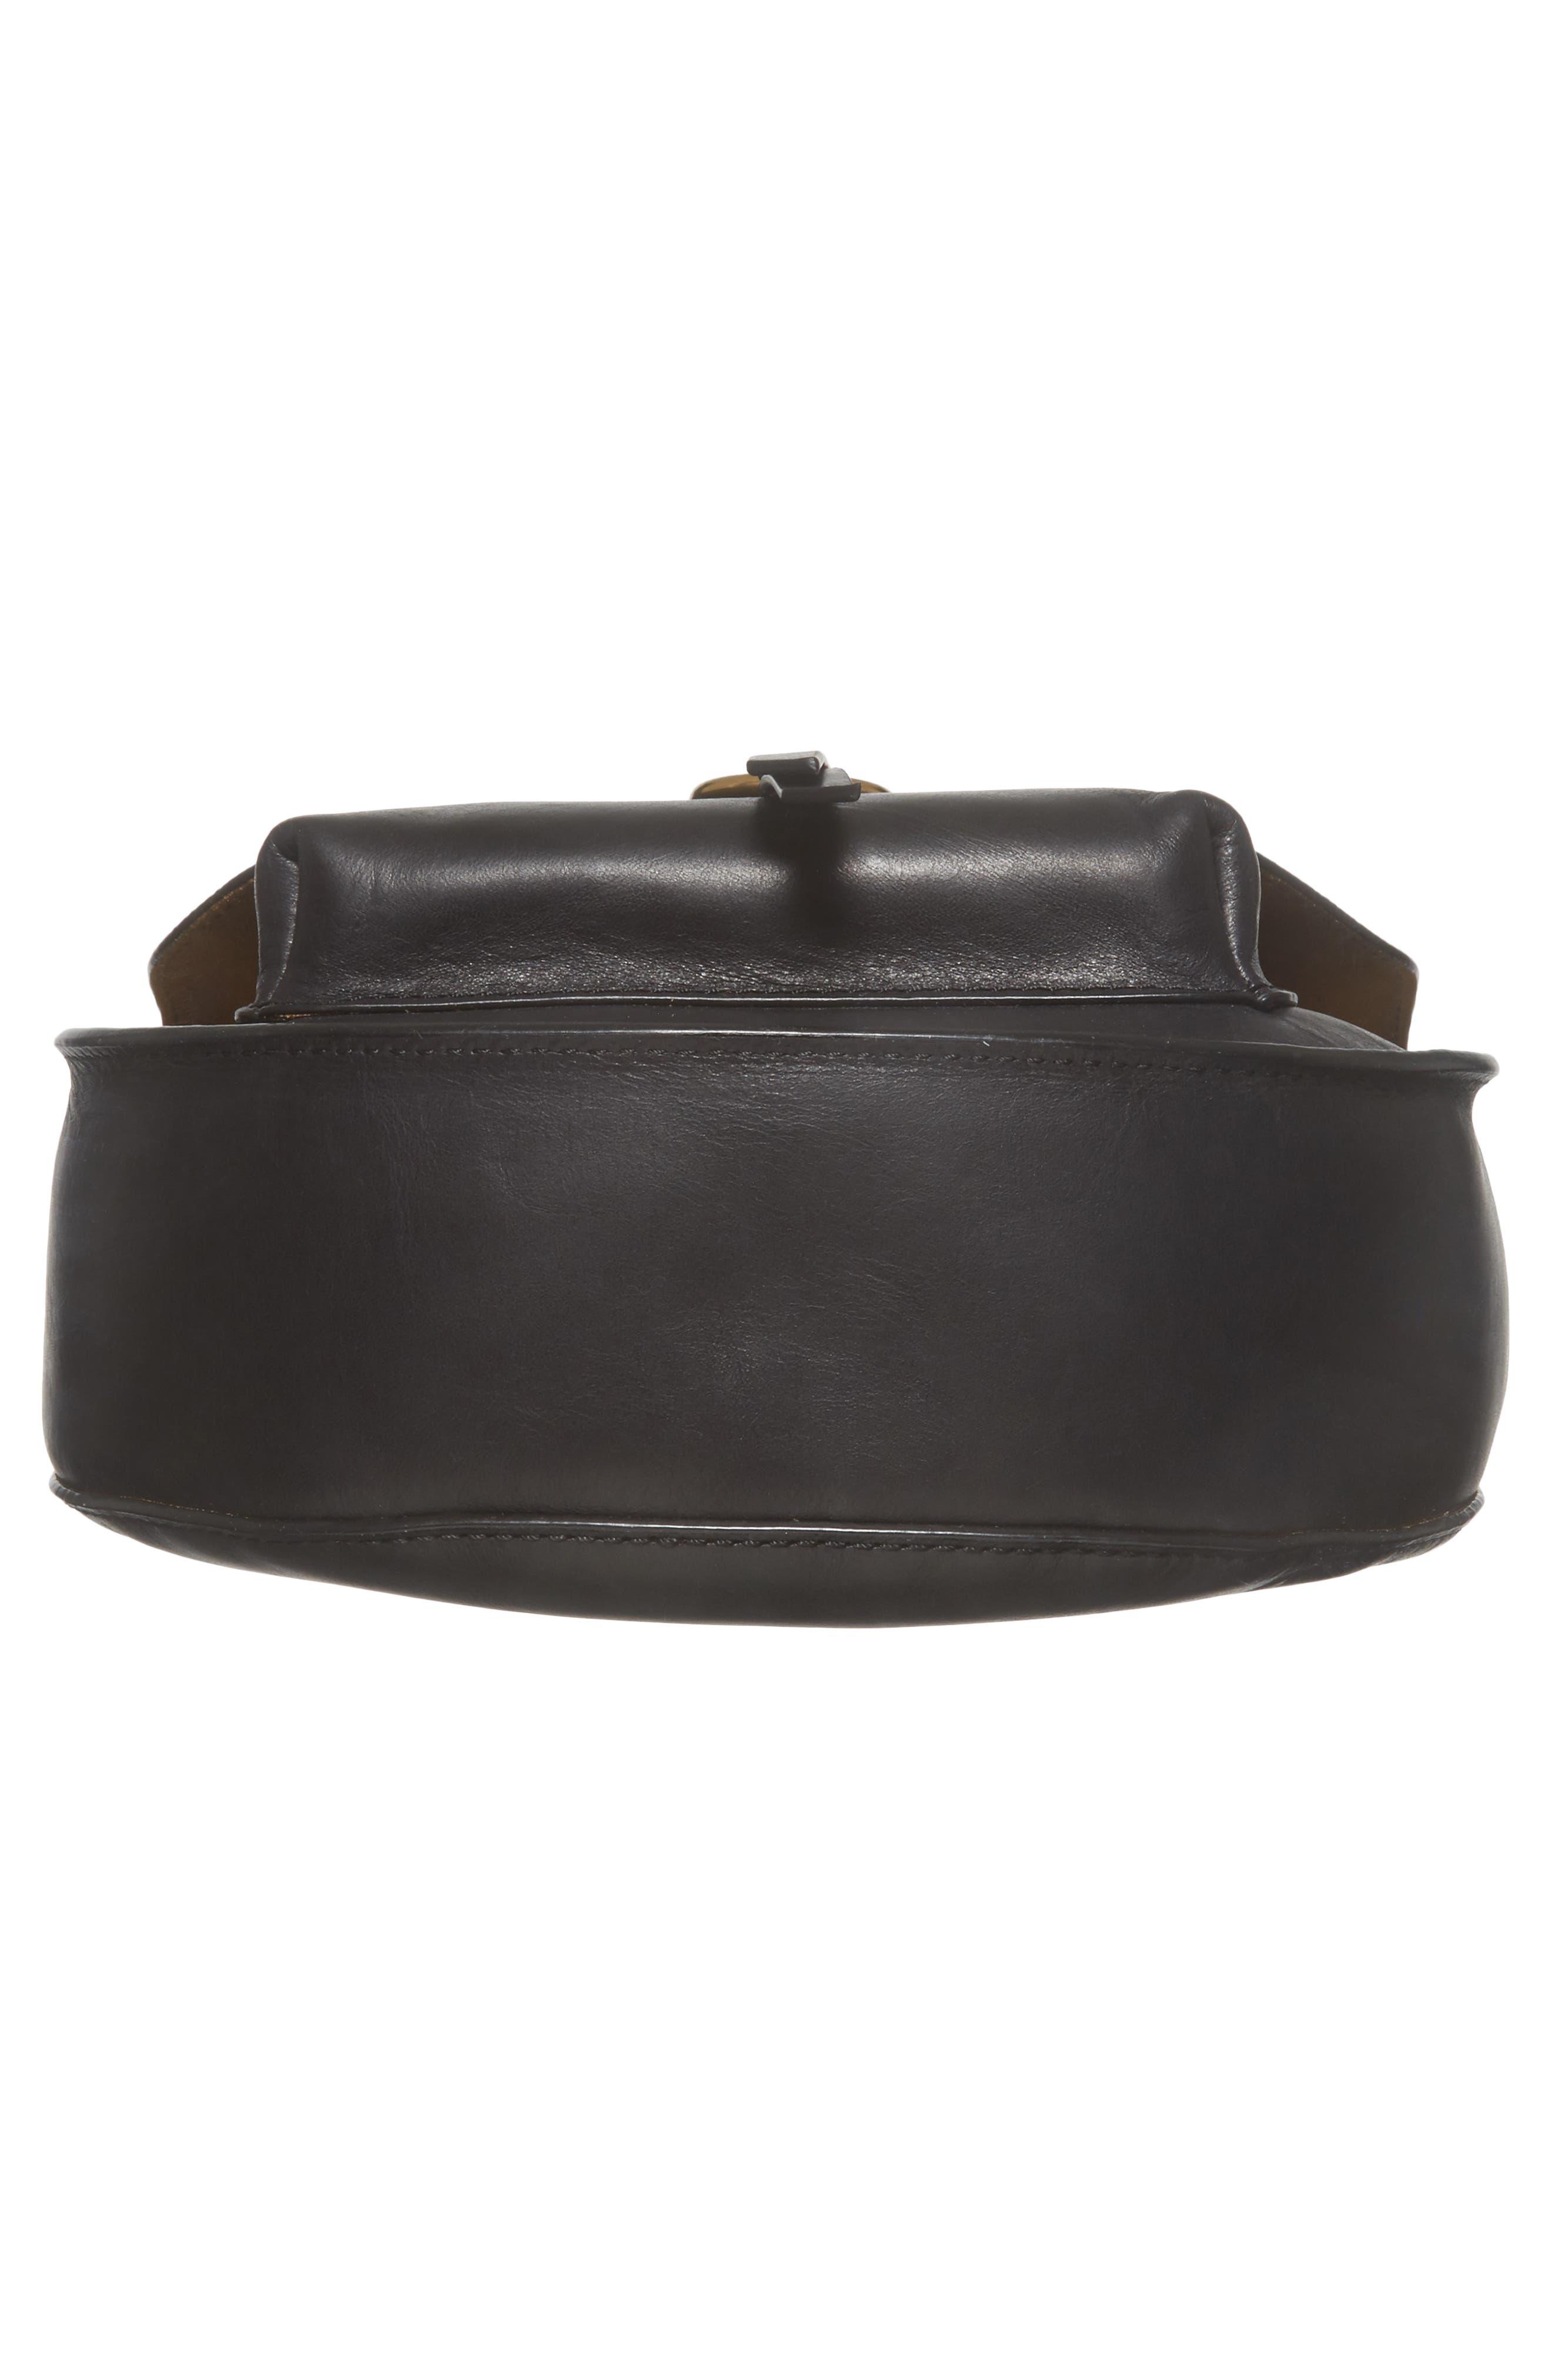 Ilana Leather Saddle Bag,                             Alternate thumbnail 6, color,                             Black